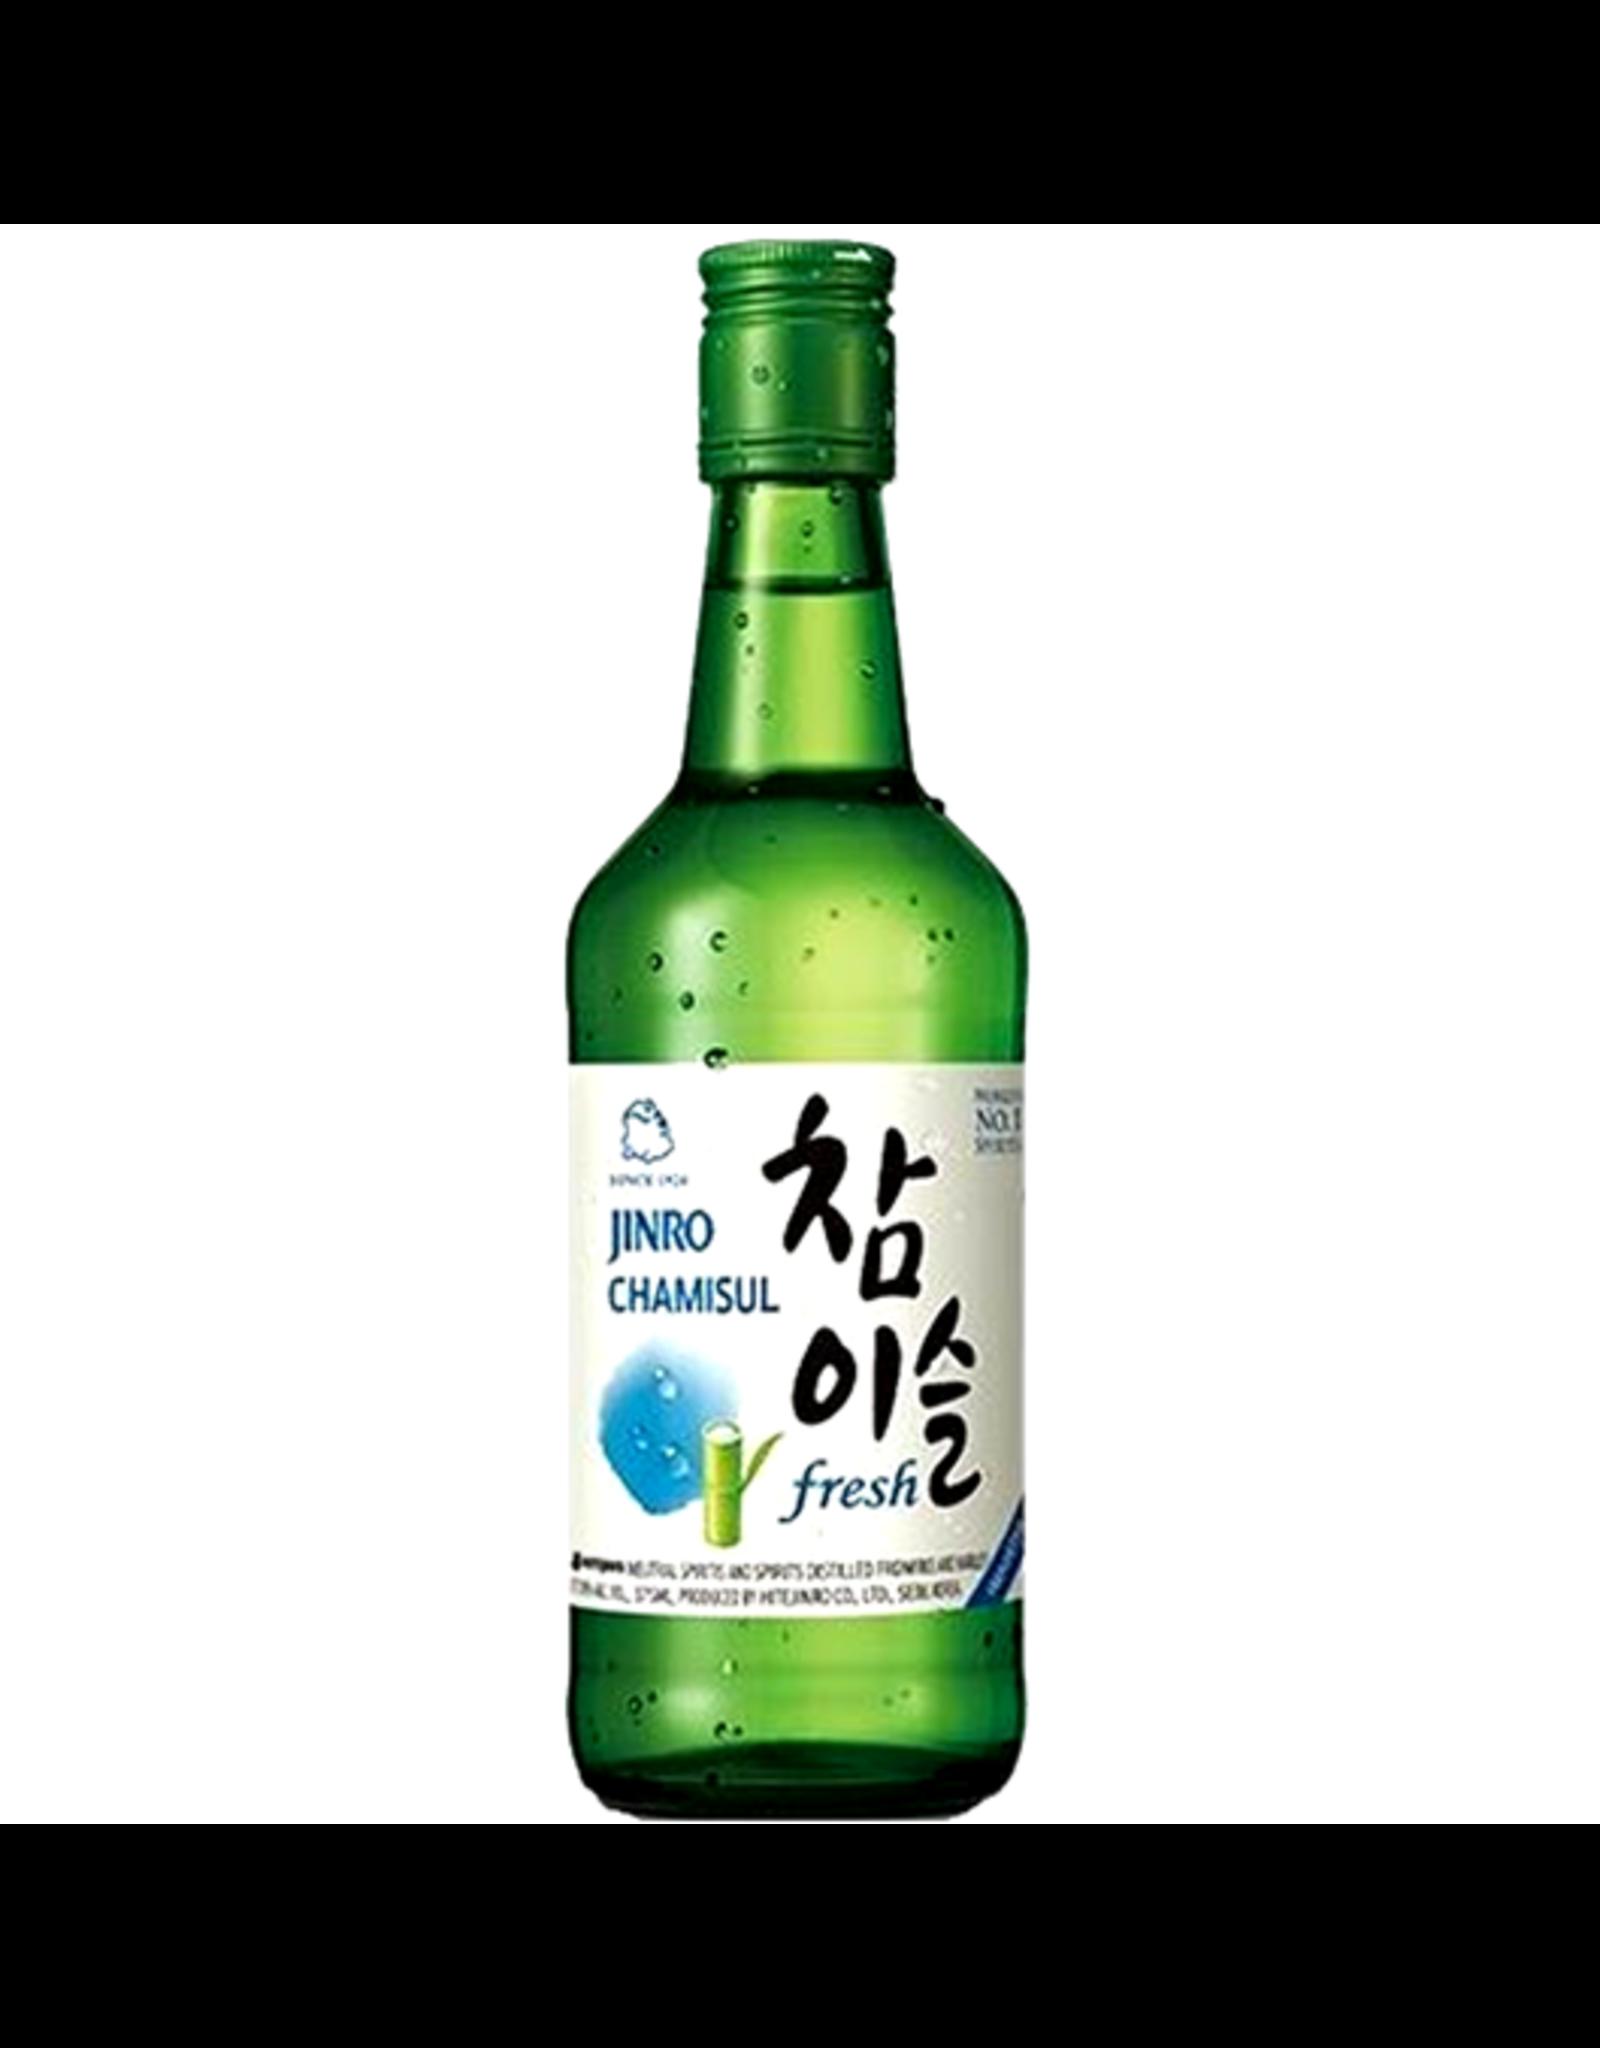 Jinro Chamisul Fresh